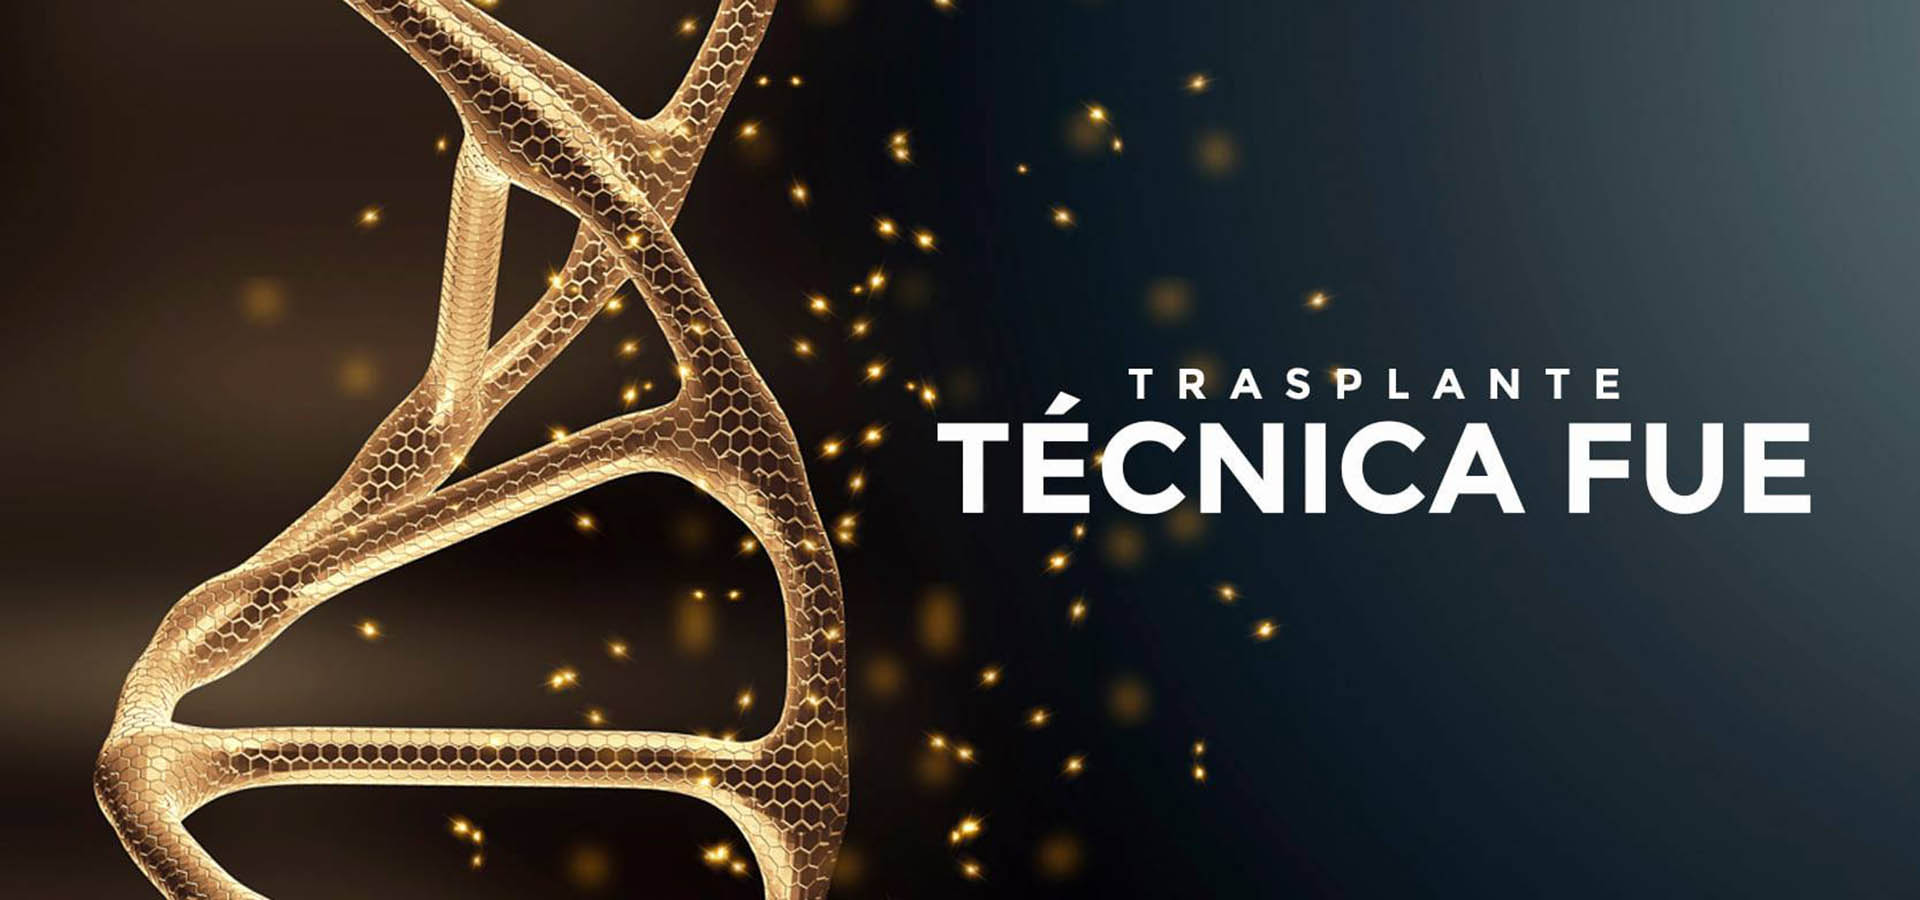 Élite Medical Madrid Trasplante técnica FUE